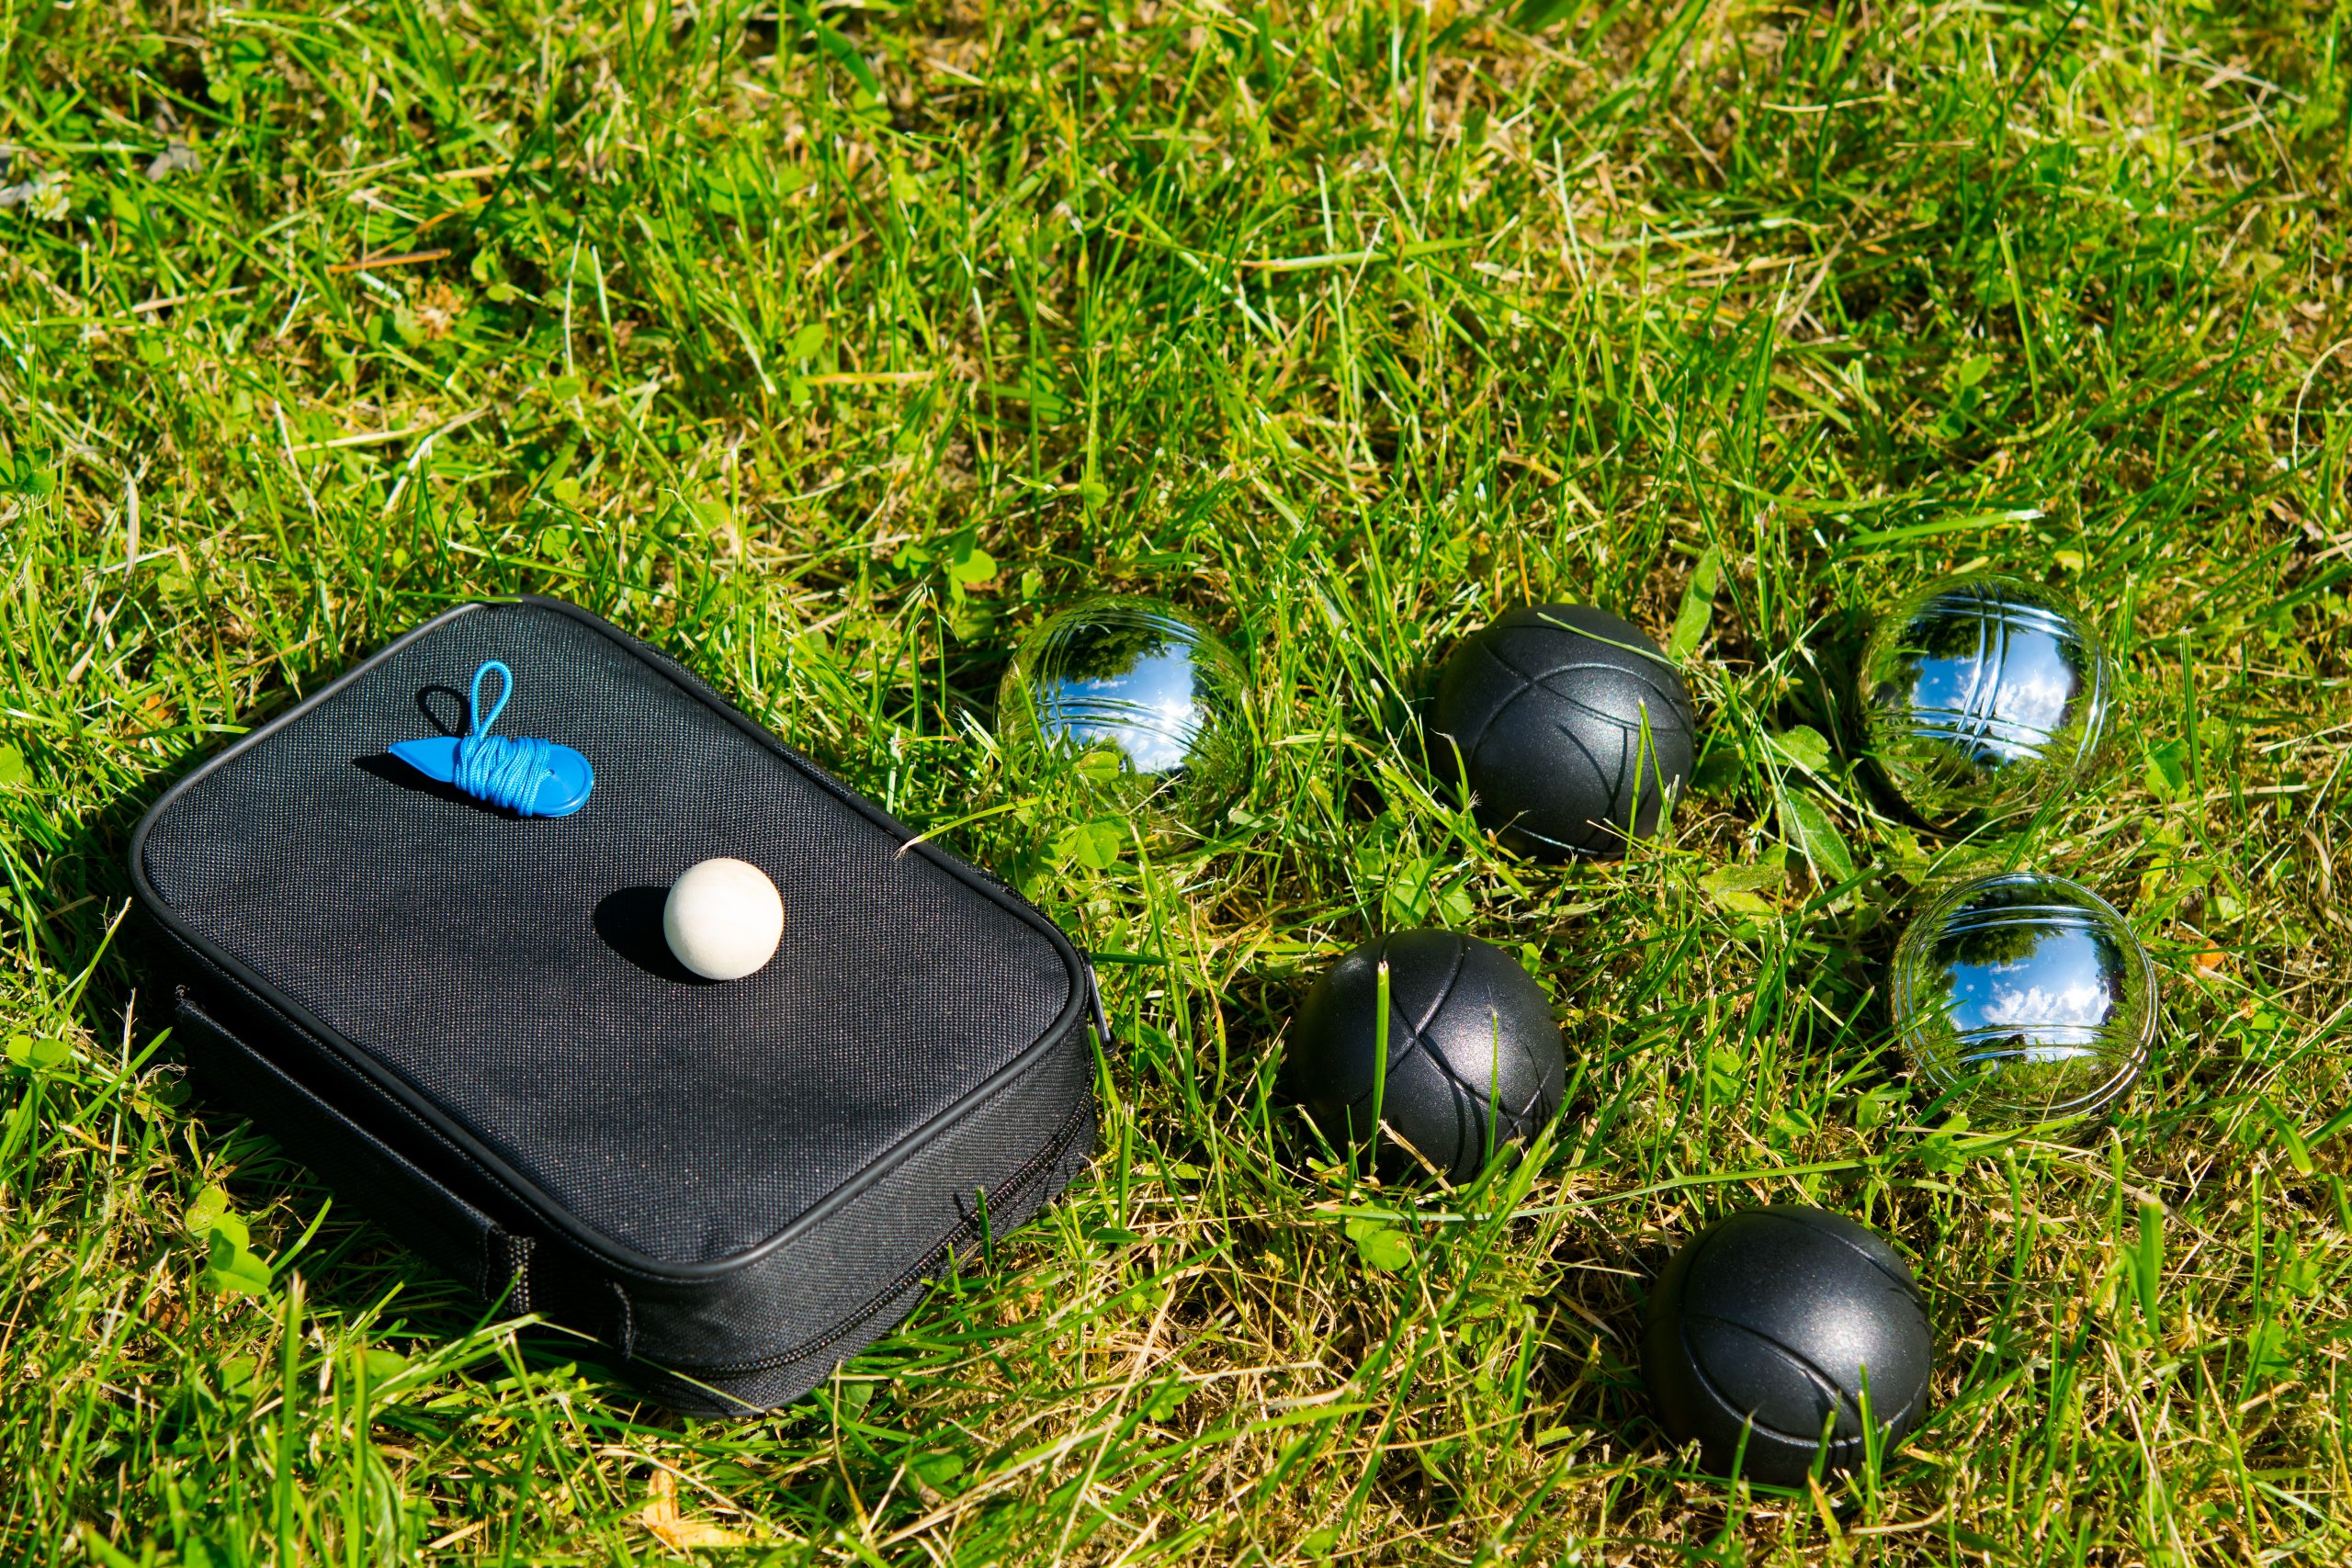 Boule Kugeln: Test & Empfehlungen (09/20)